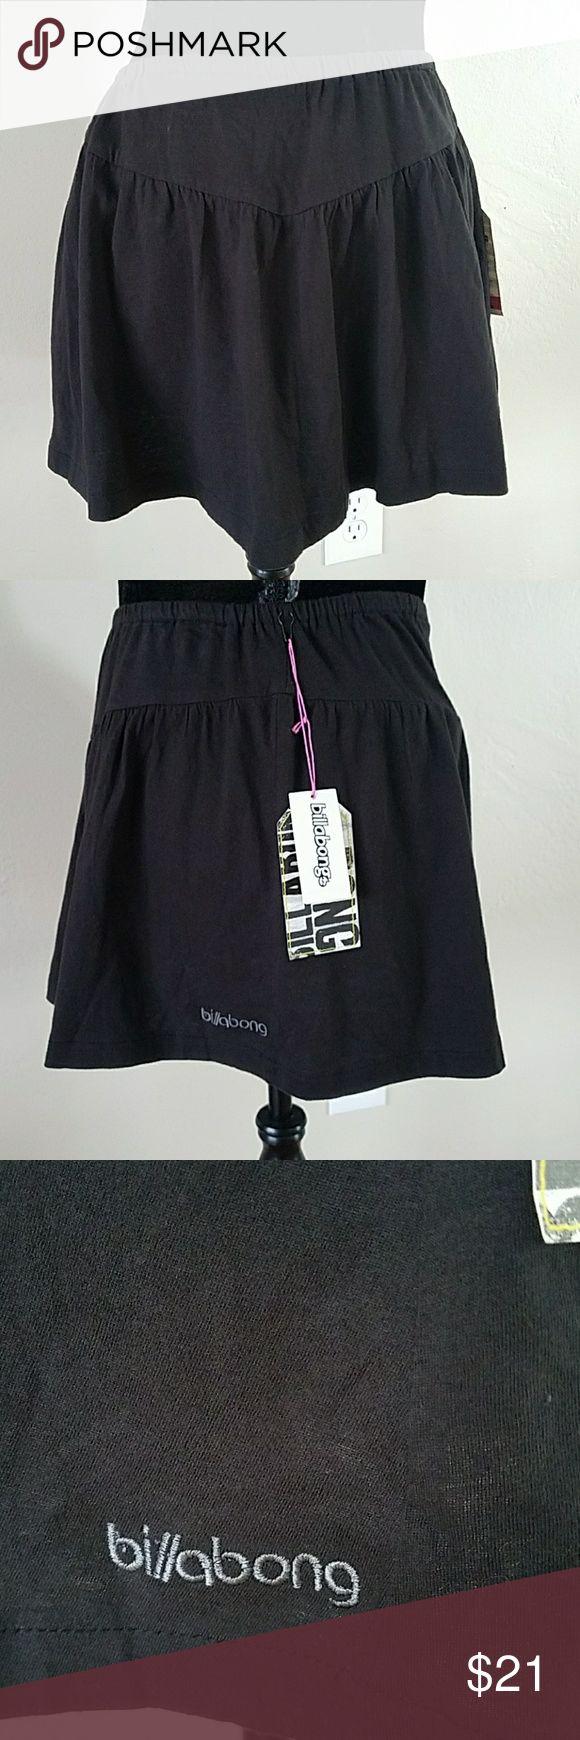 "Billabong Black Mini Skirt Billabong Black 100% Cotton Mini Skirt Womens size Medium All measurements are approximate and taken flat  Waist 13"" Length 12"" Small hole near tag attachment. Not noticeable when worn Billabong Skirts Mini"